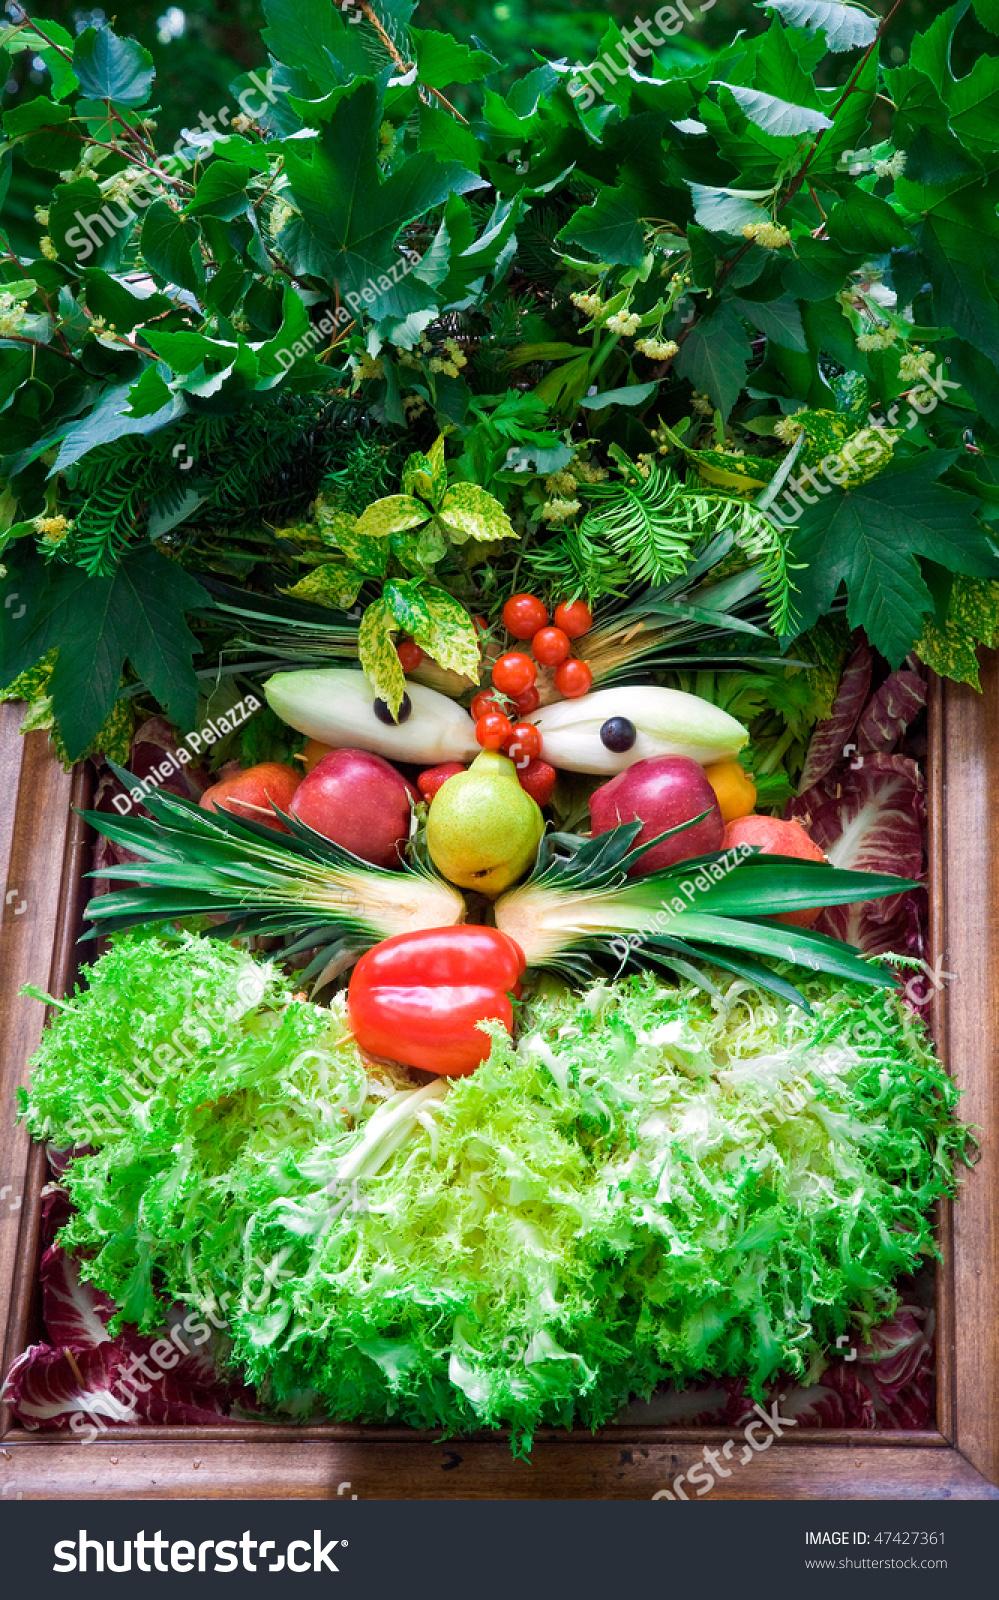 Human Face Vegetables Fruits Manner Arcimboldi Stock Photo ...